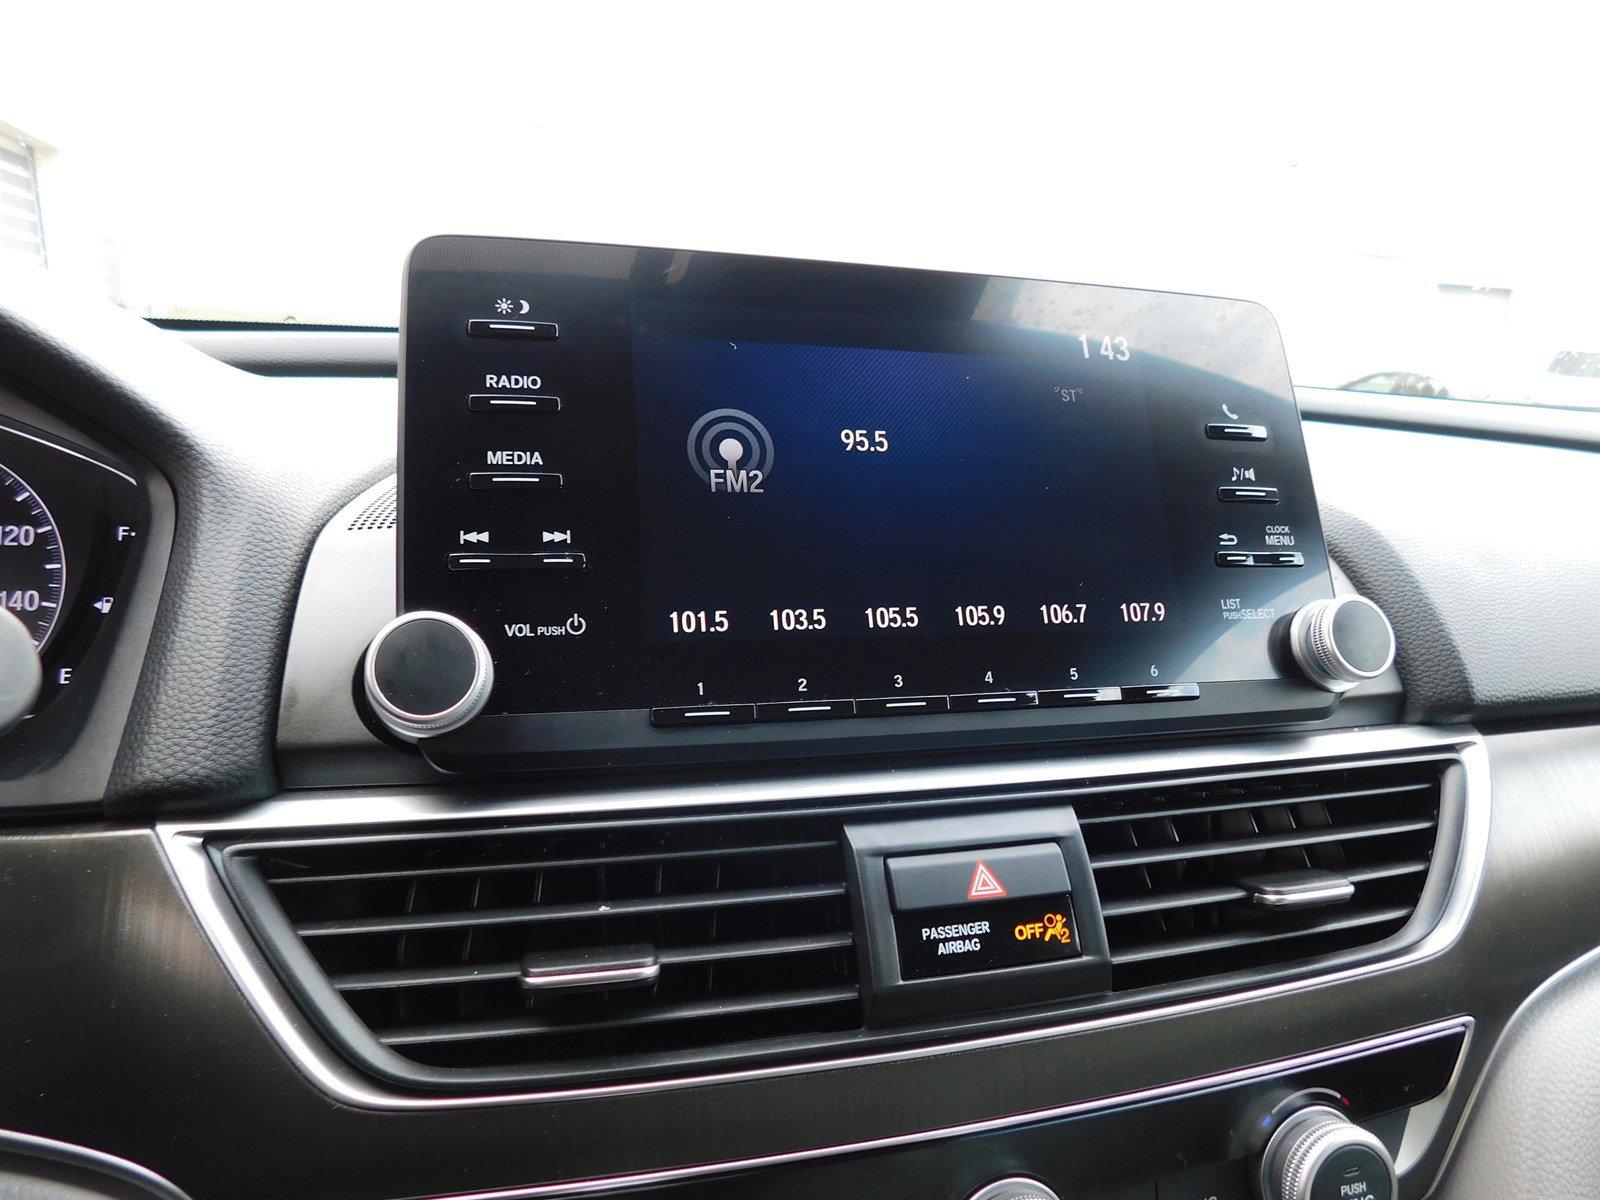 Pre-Owned 2019 Honda Accord LX 1.5T